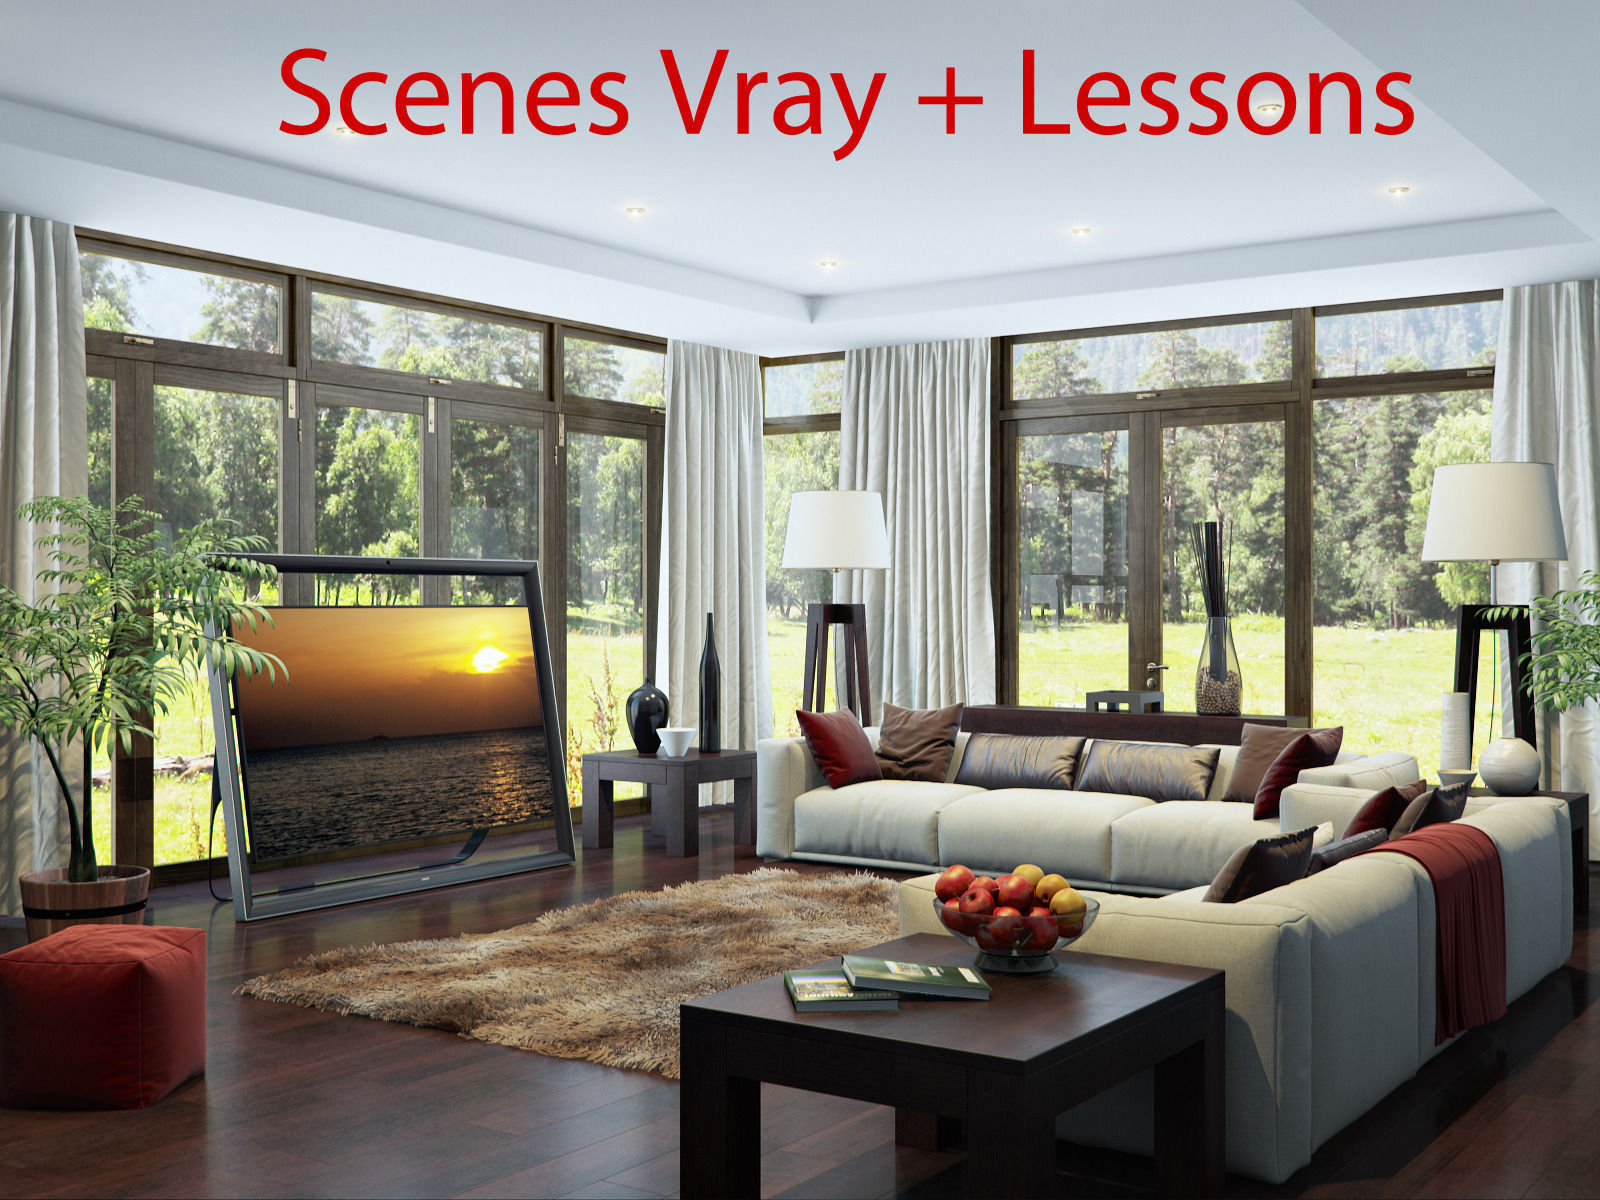 Living room v ray interior scene 3d model max for Dining room 3d max interior scenes